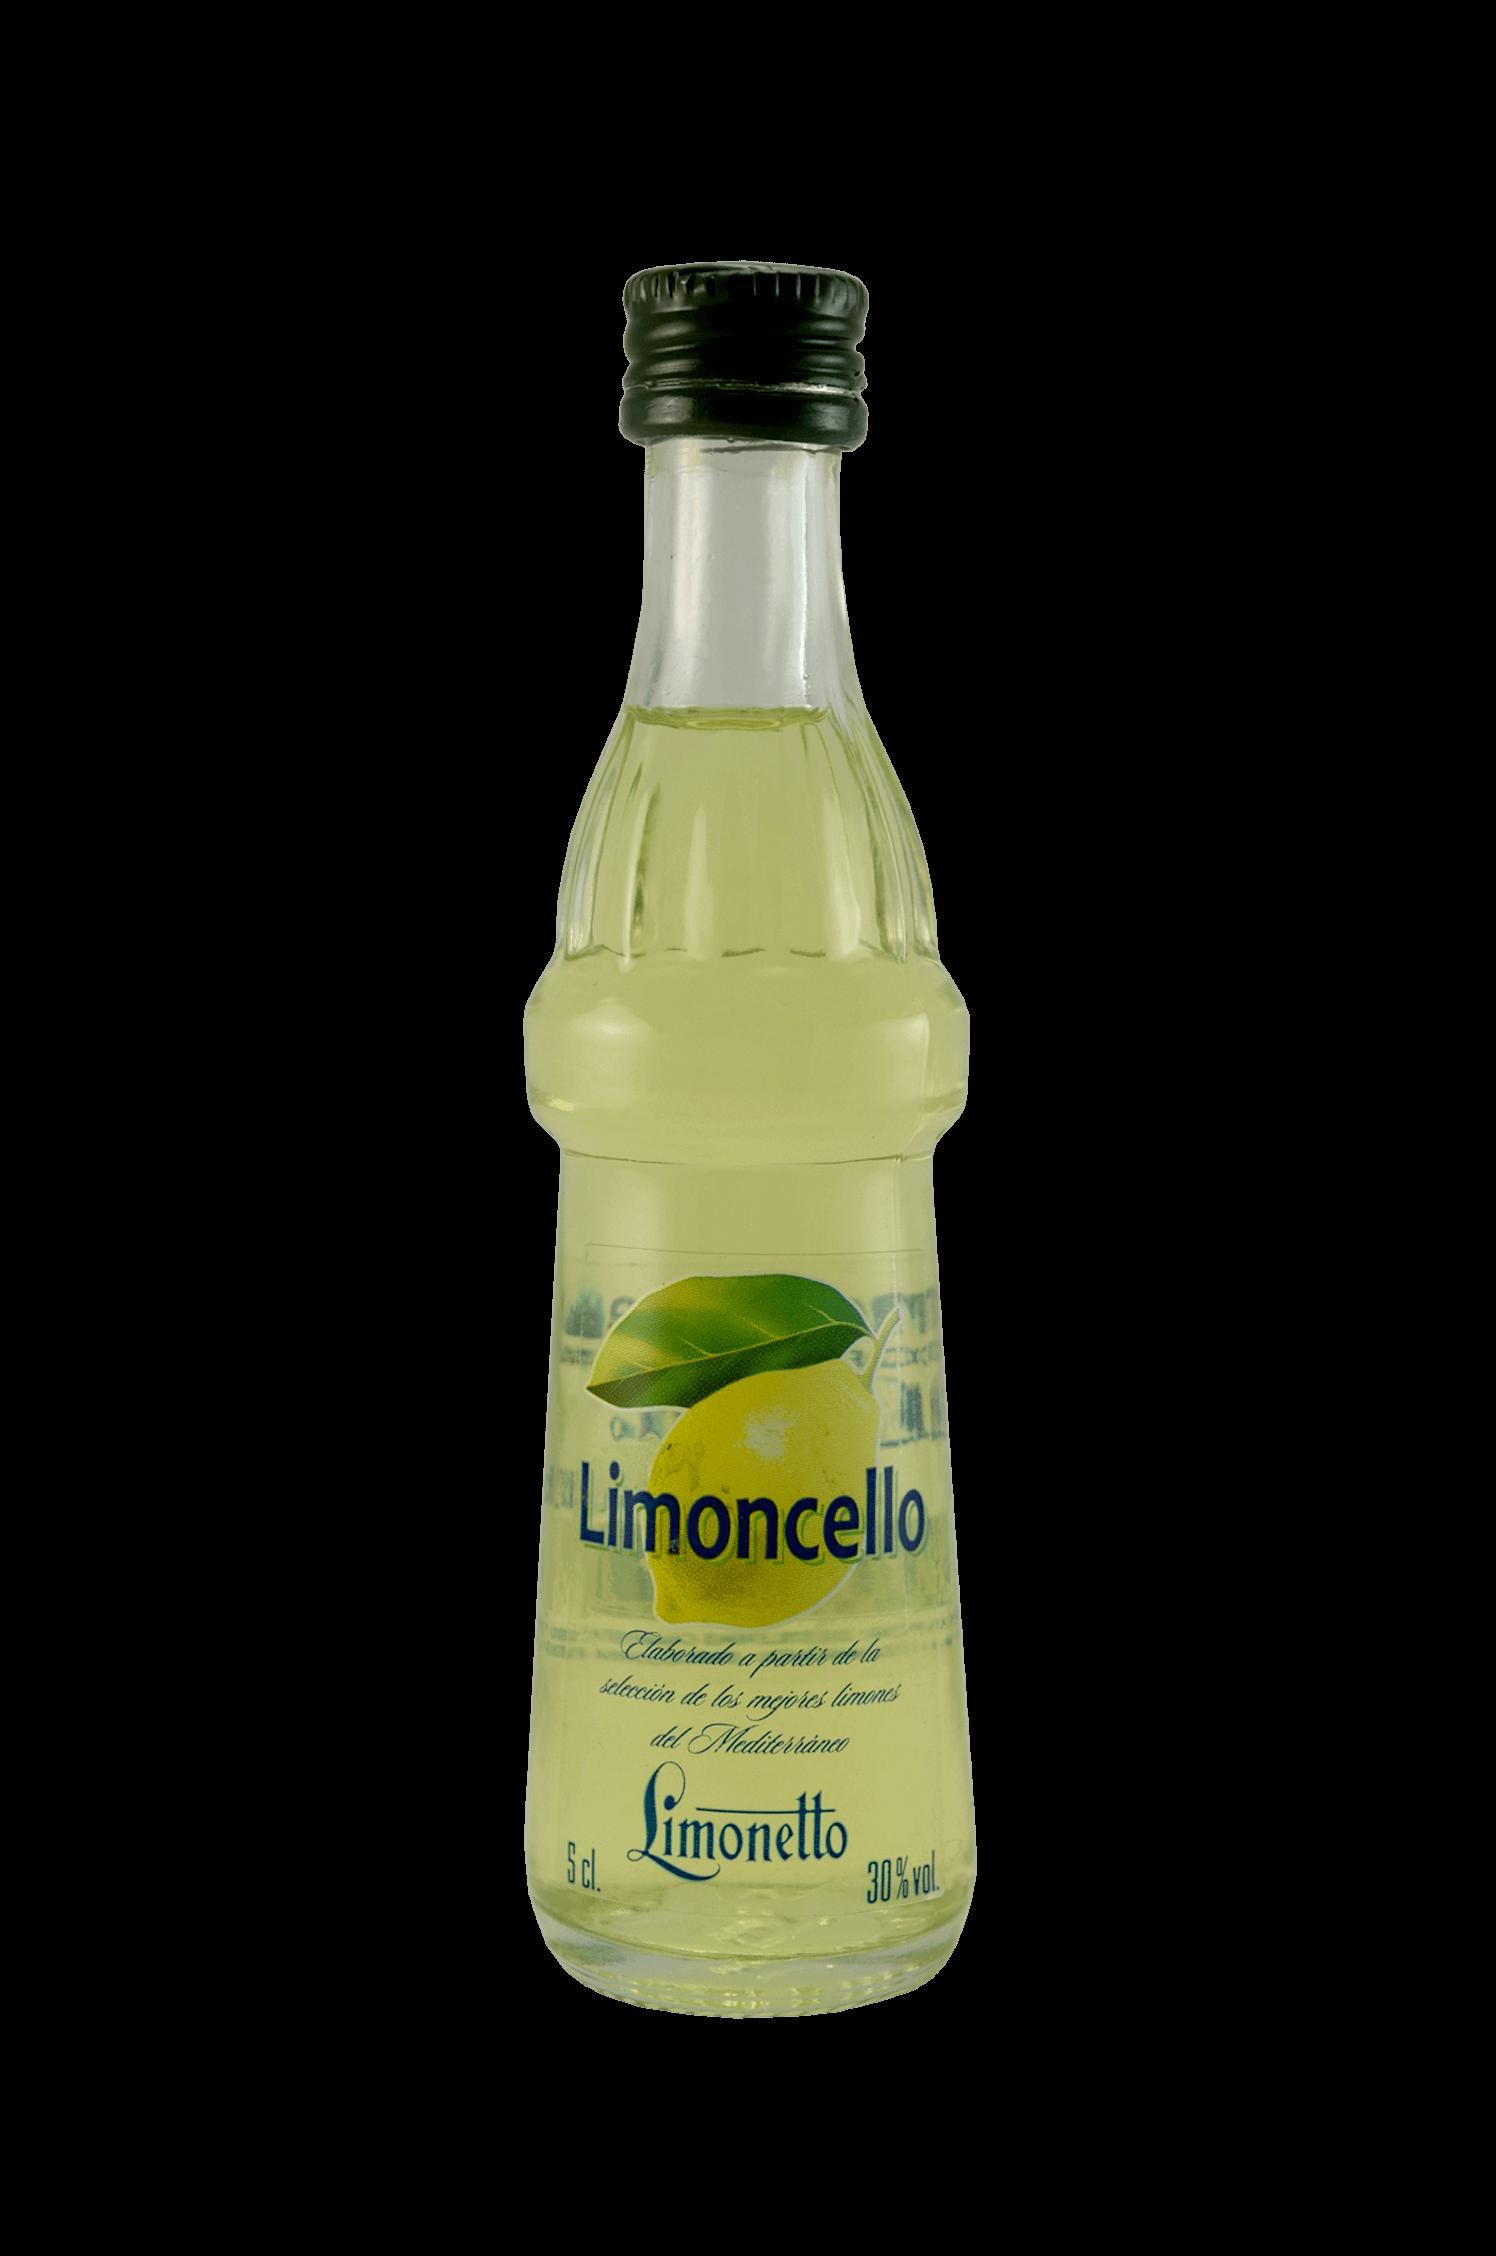 Limoncello Limonetto